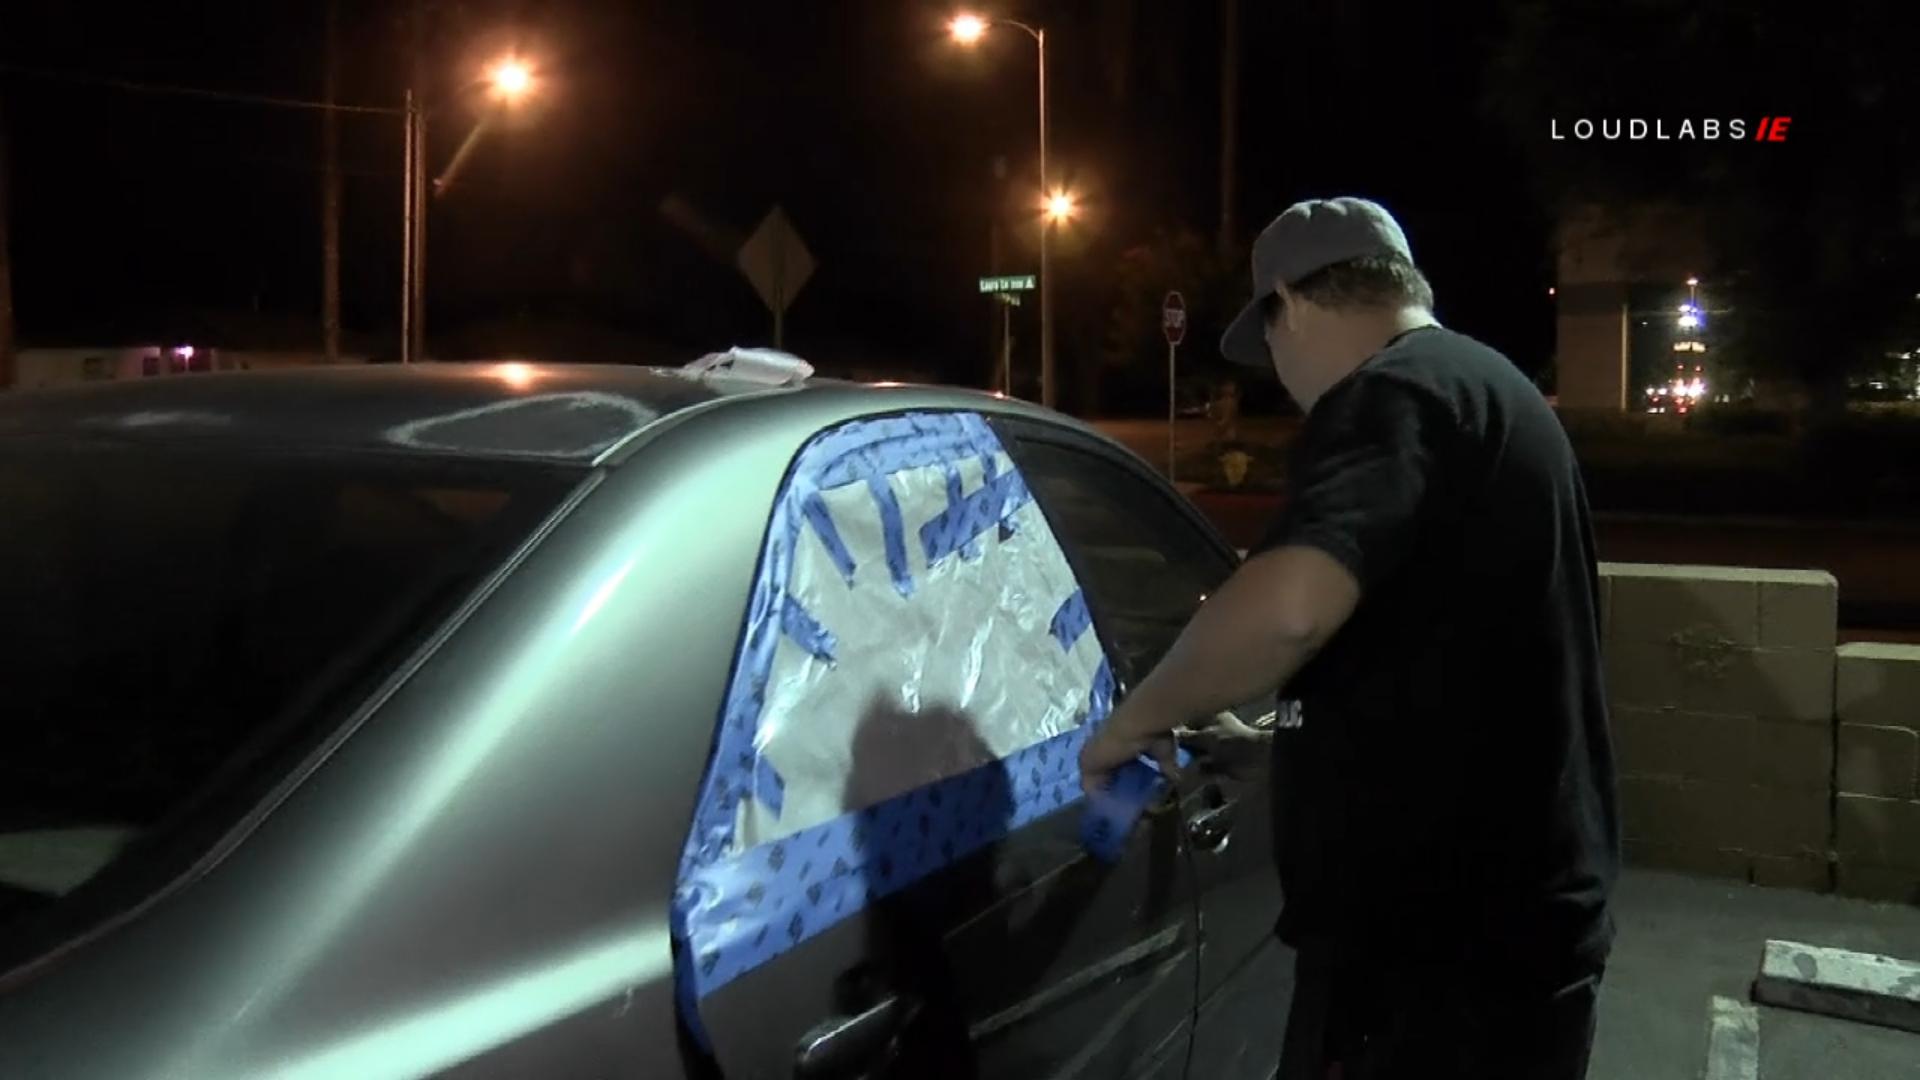 RIVERSIDE: Rocks Tossed Onto Freeway Damage Several Vehicles